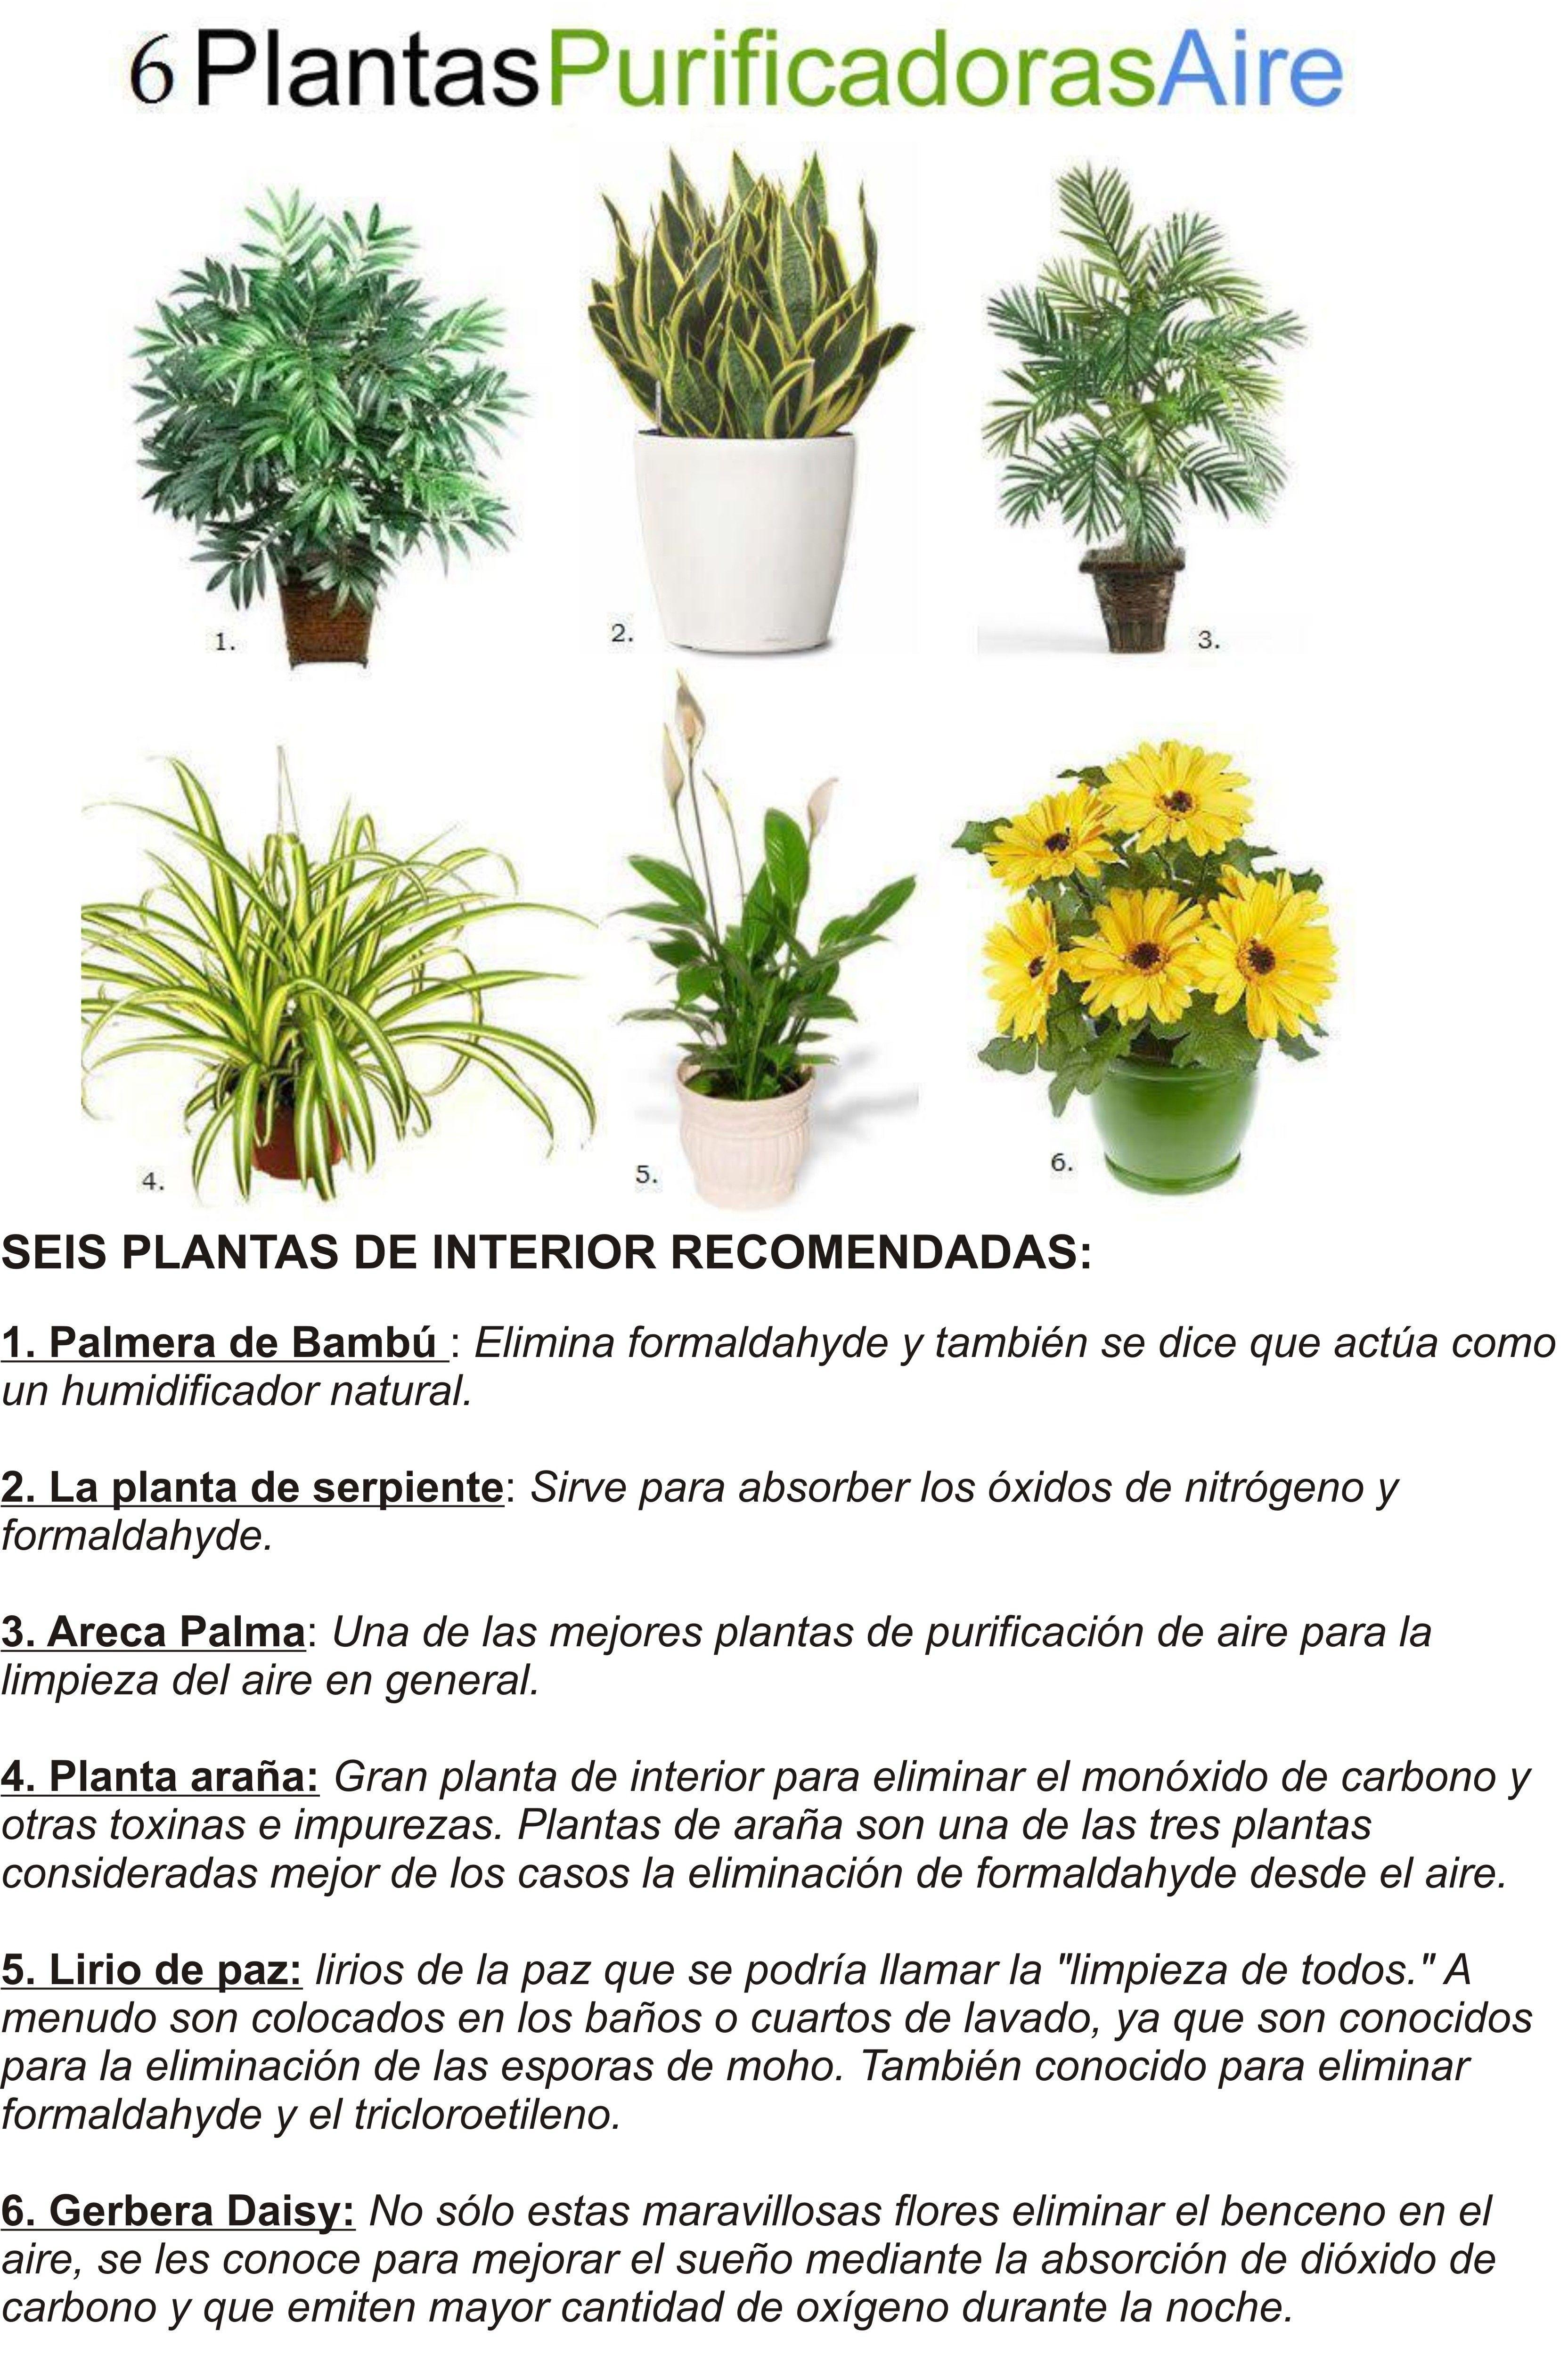 Plantas de interior purificadoras de aire SEMBRANDO